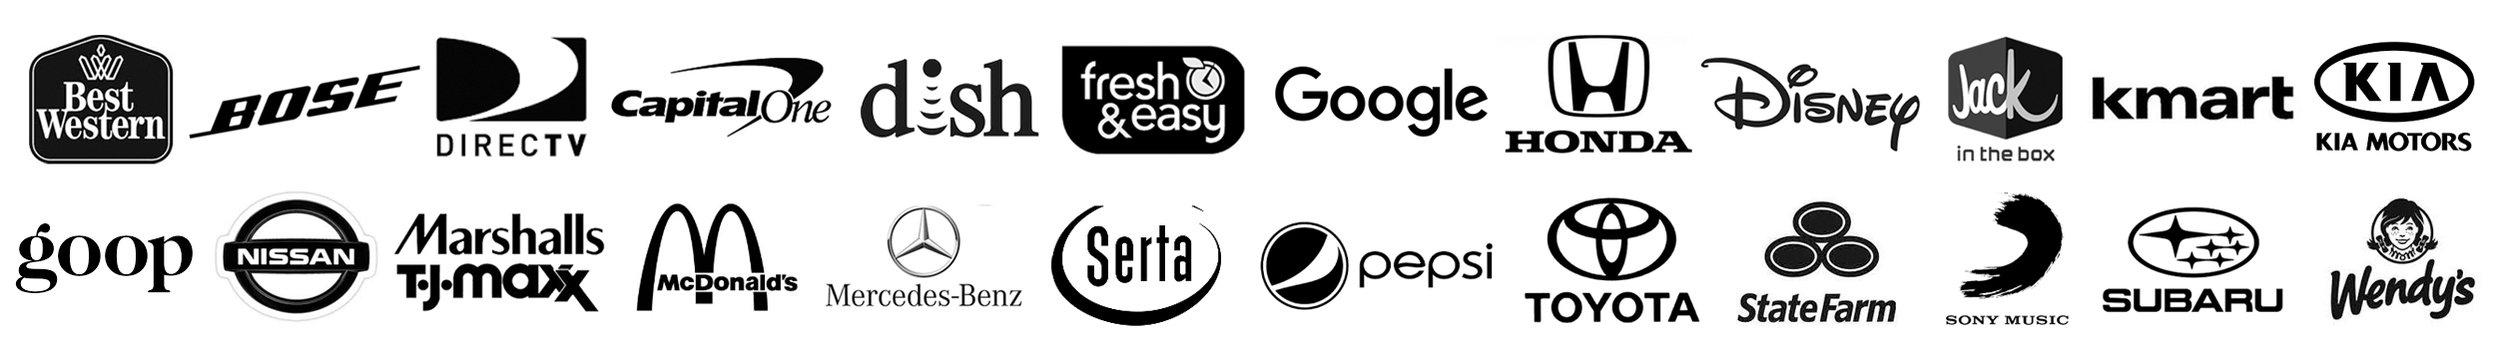 Brand_Logos_1_19R.jpg